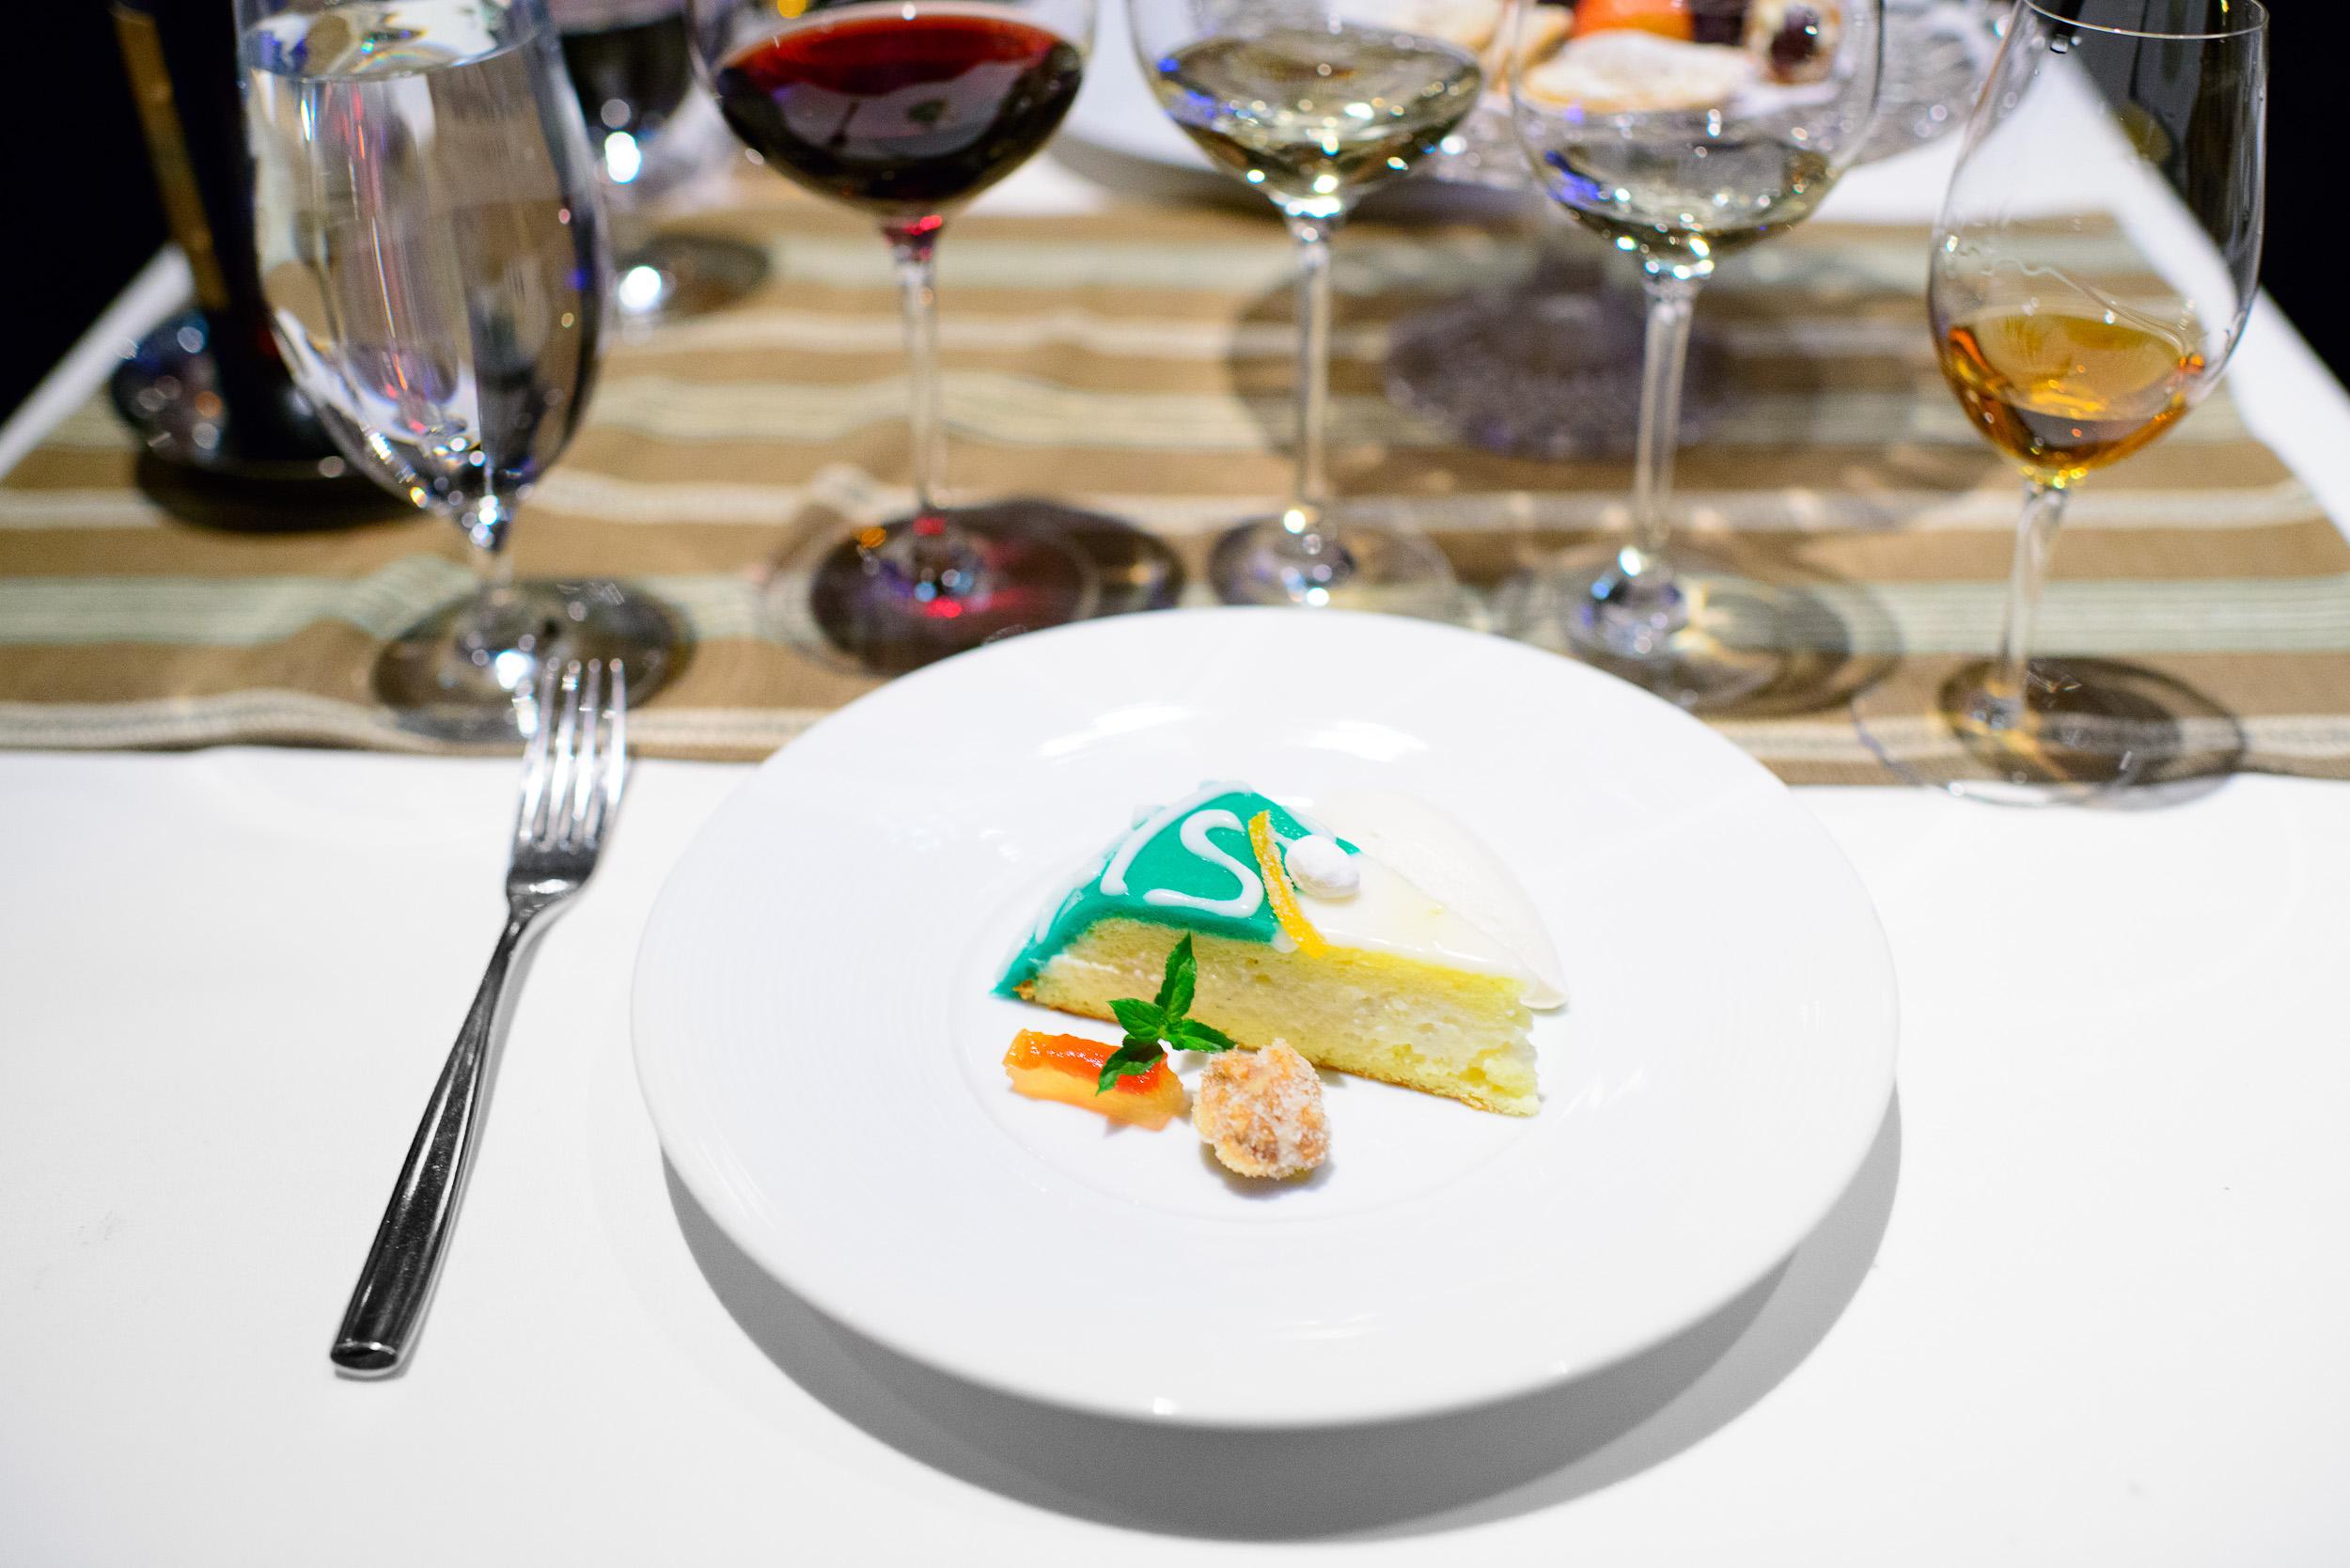 8th Course: Cassata (A slice of marzipan-ricotta cake)